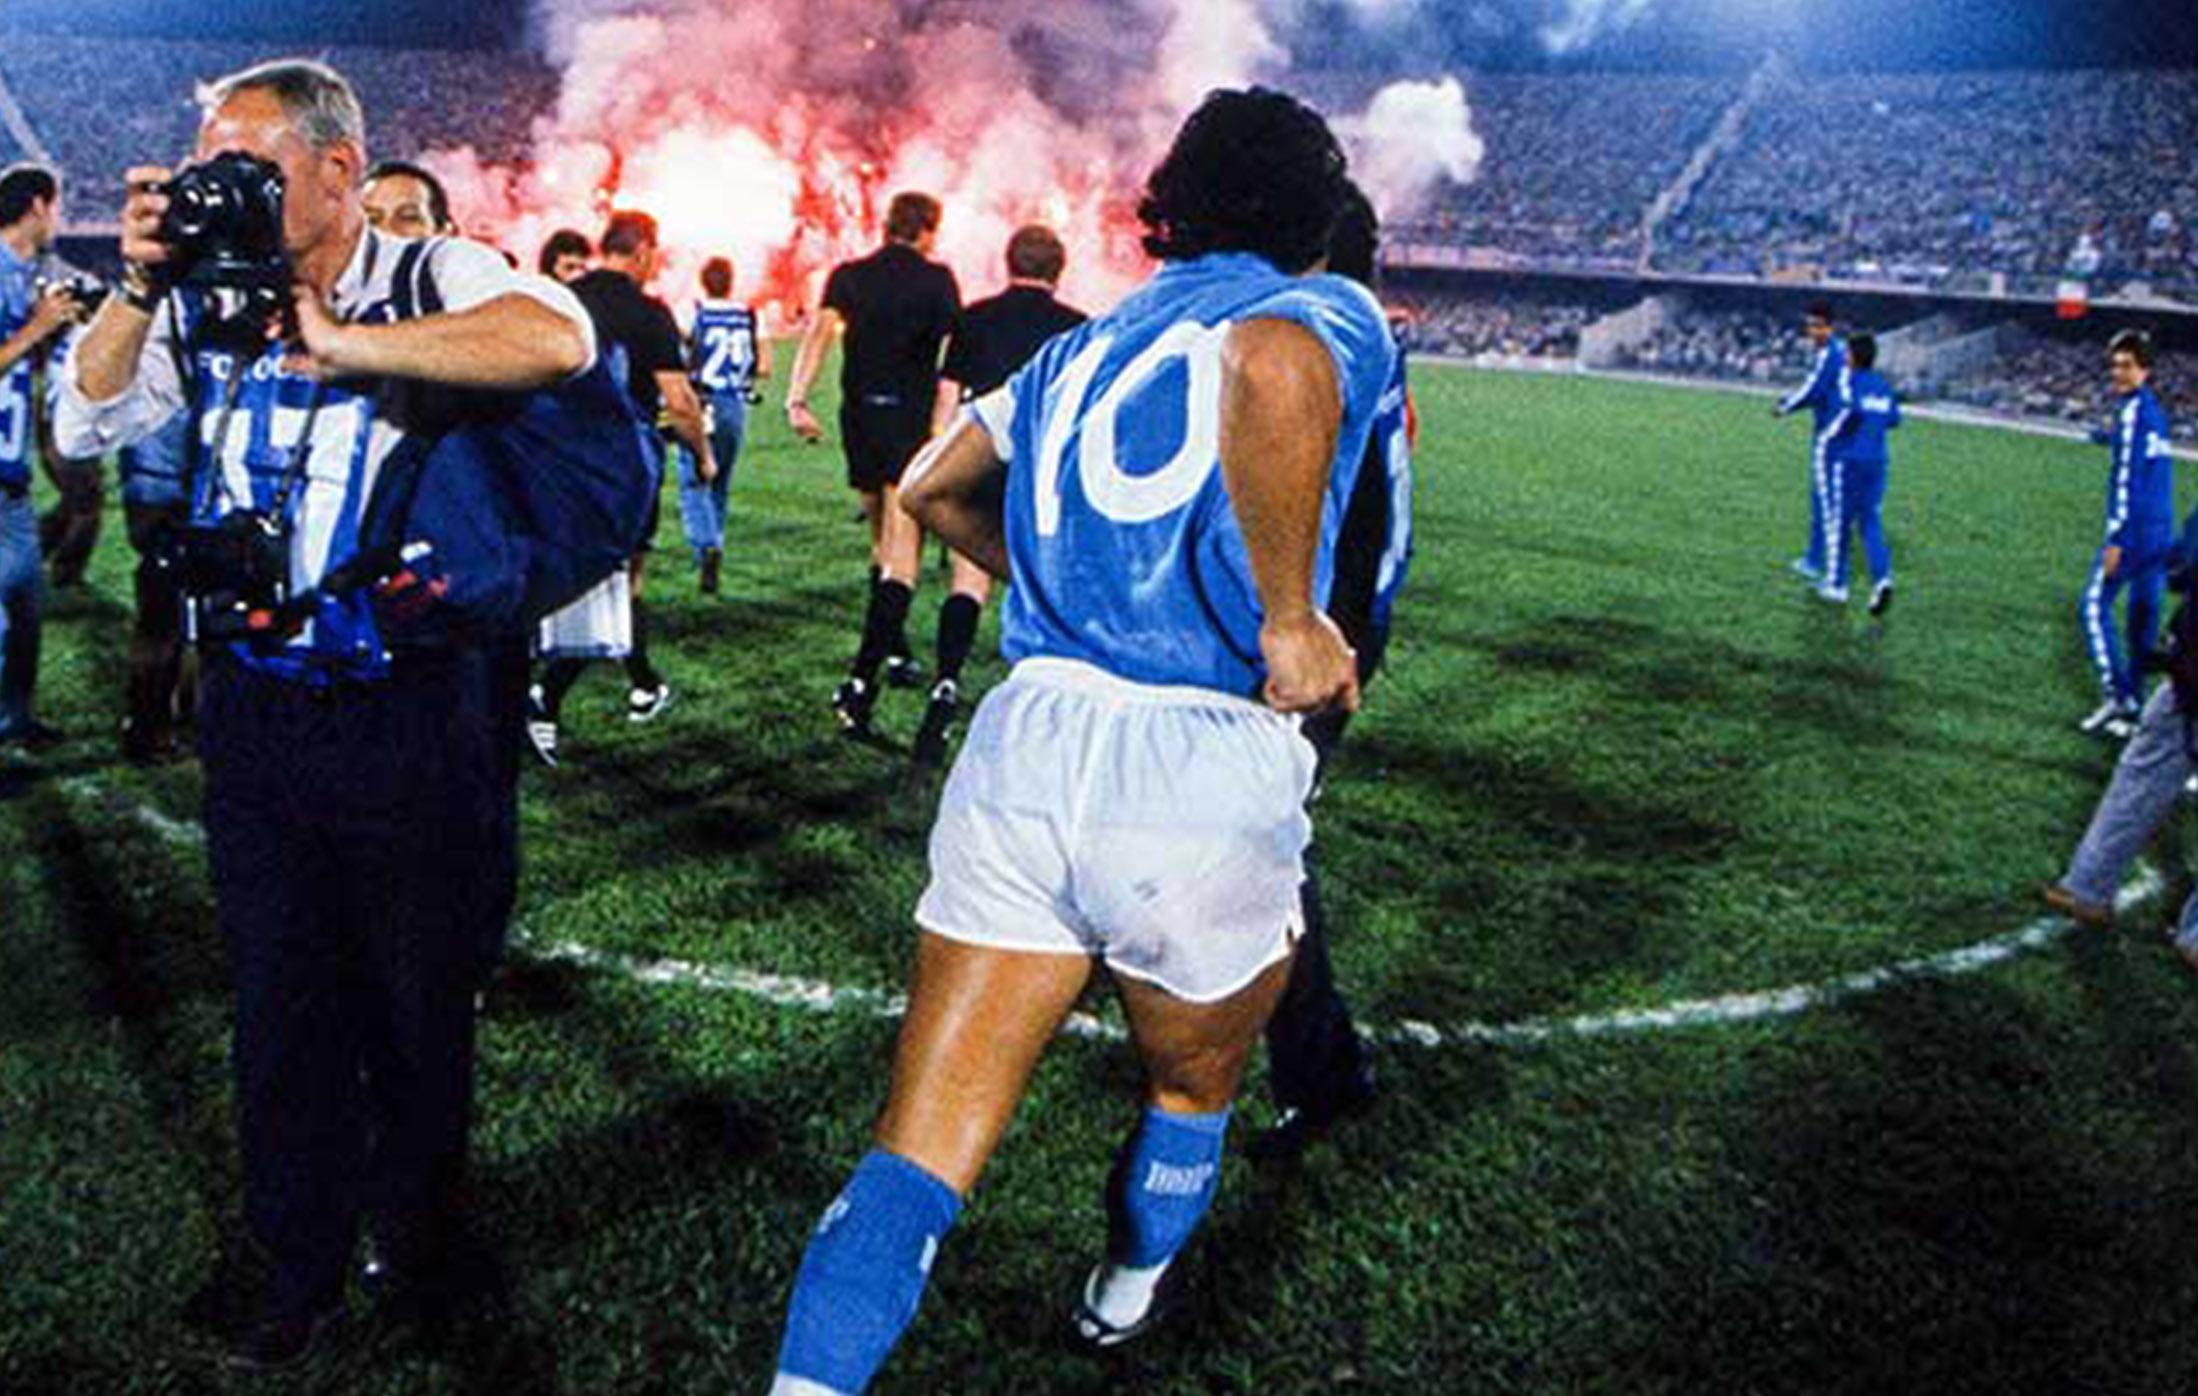 Naples: le Stade de San Polo sera rebaptisé à l'honneur de Maradona